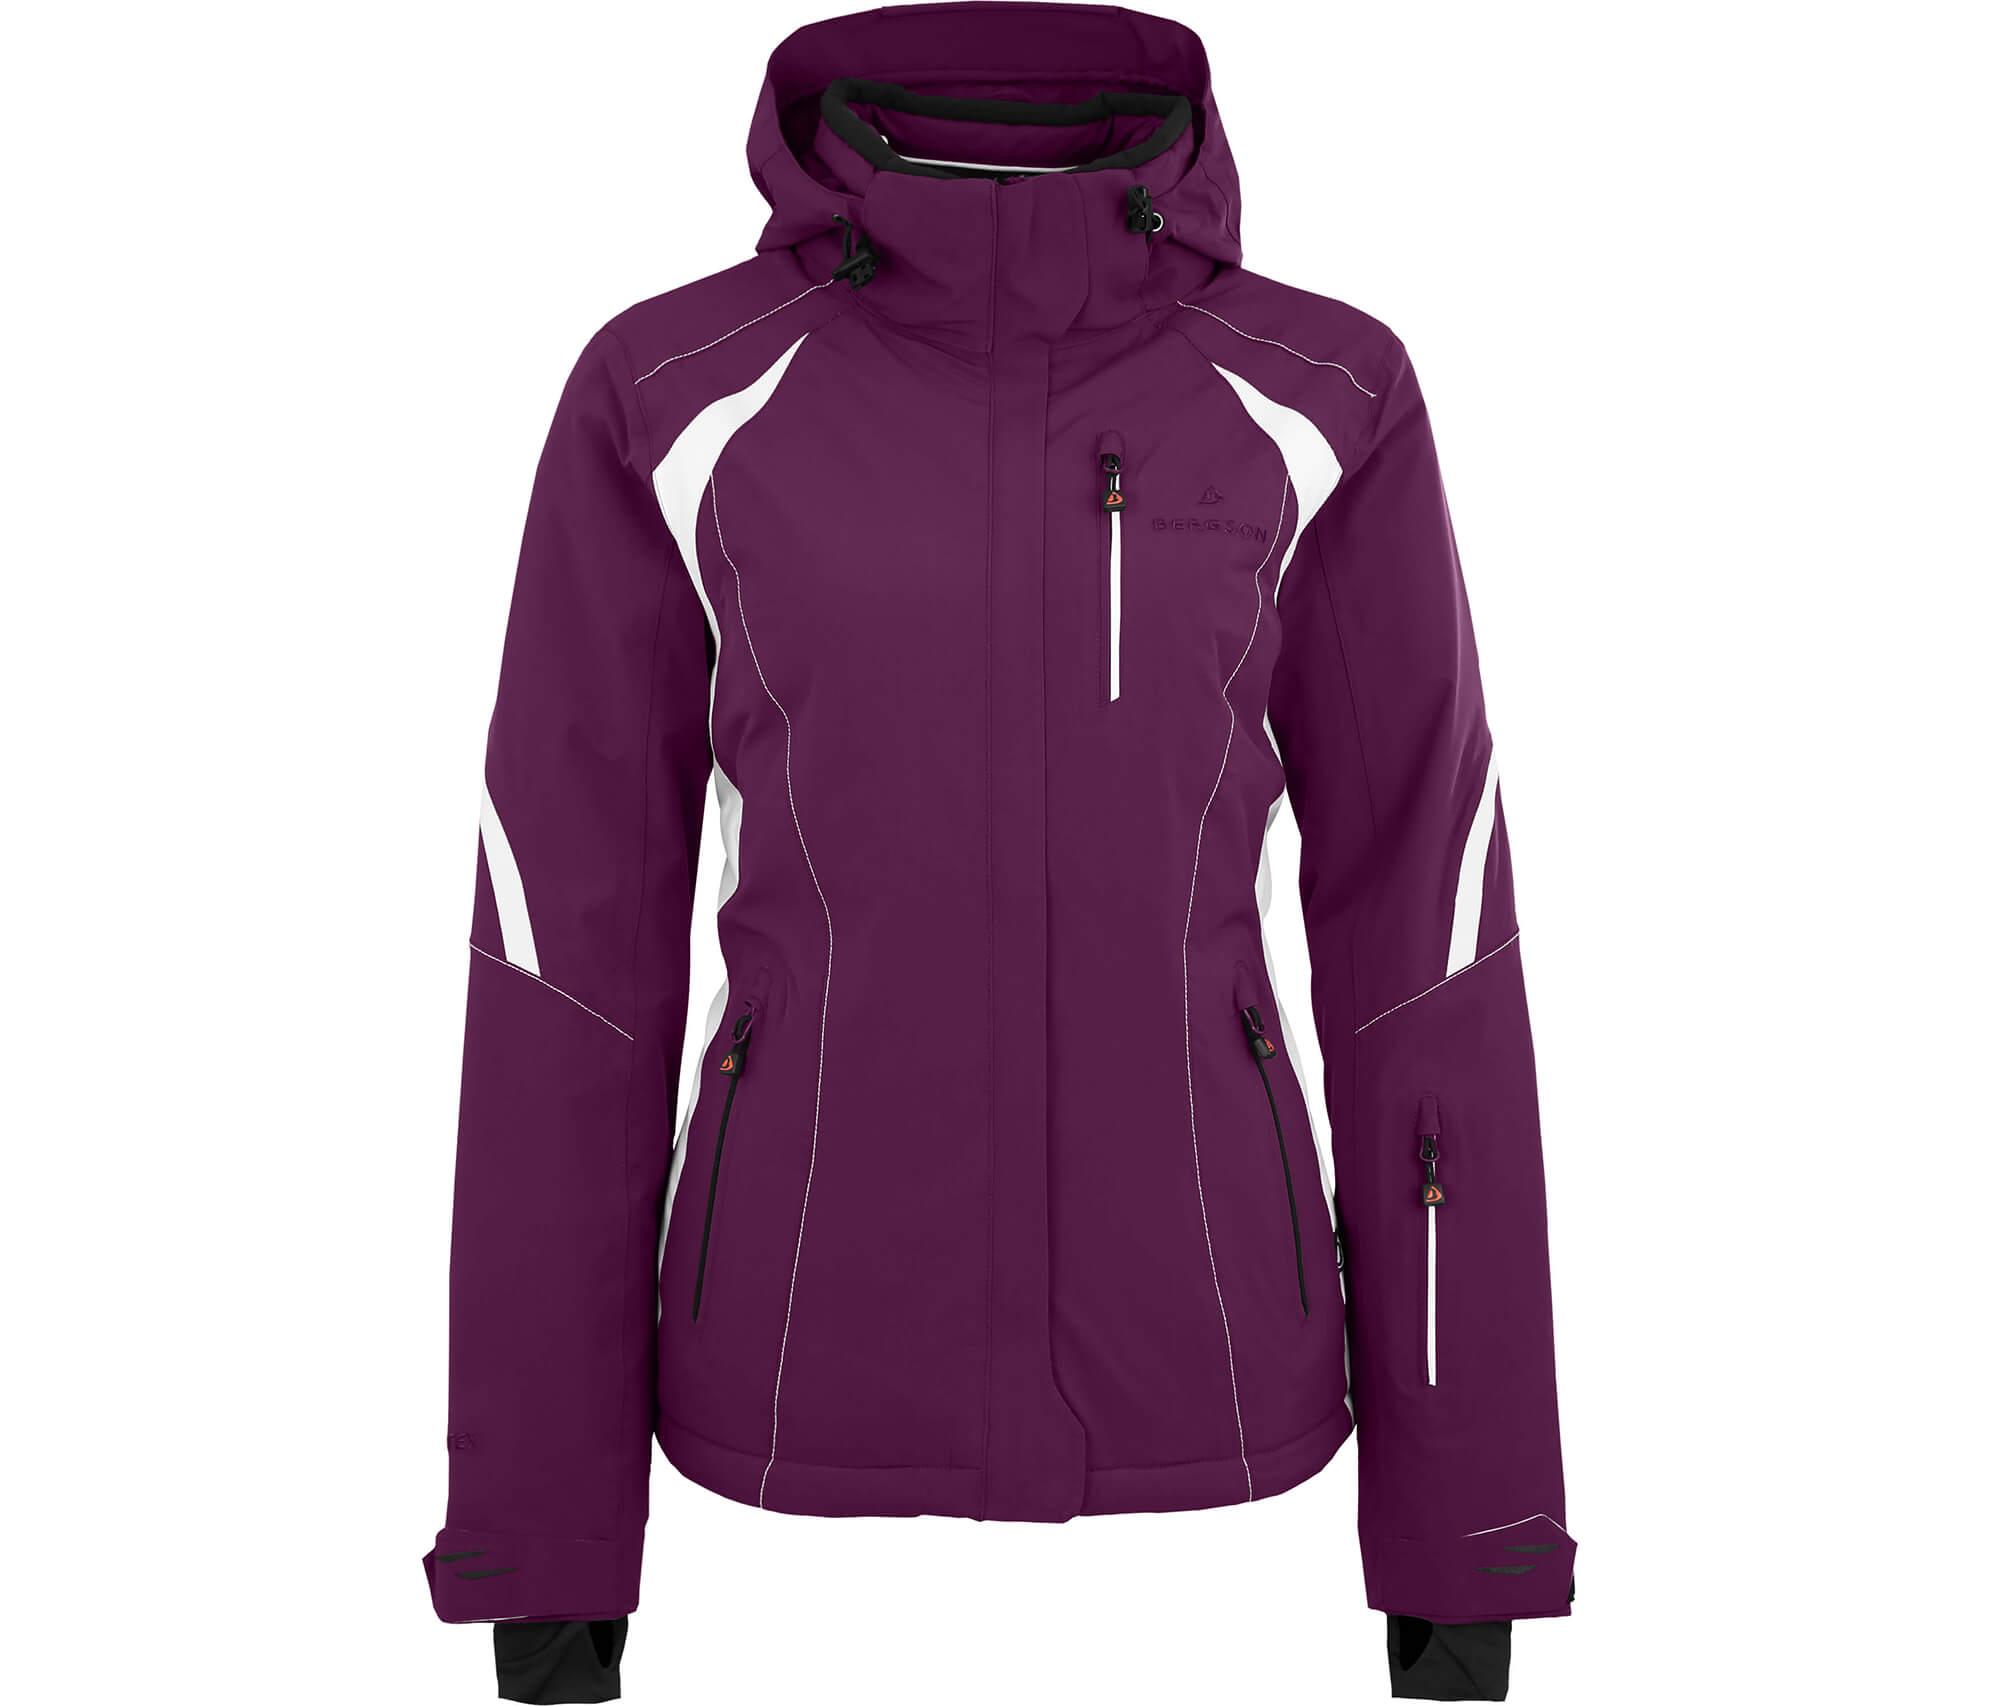 Bergson Damen Skijacke SNOWTASTIC dunkel violett